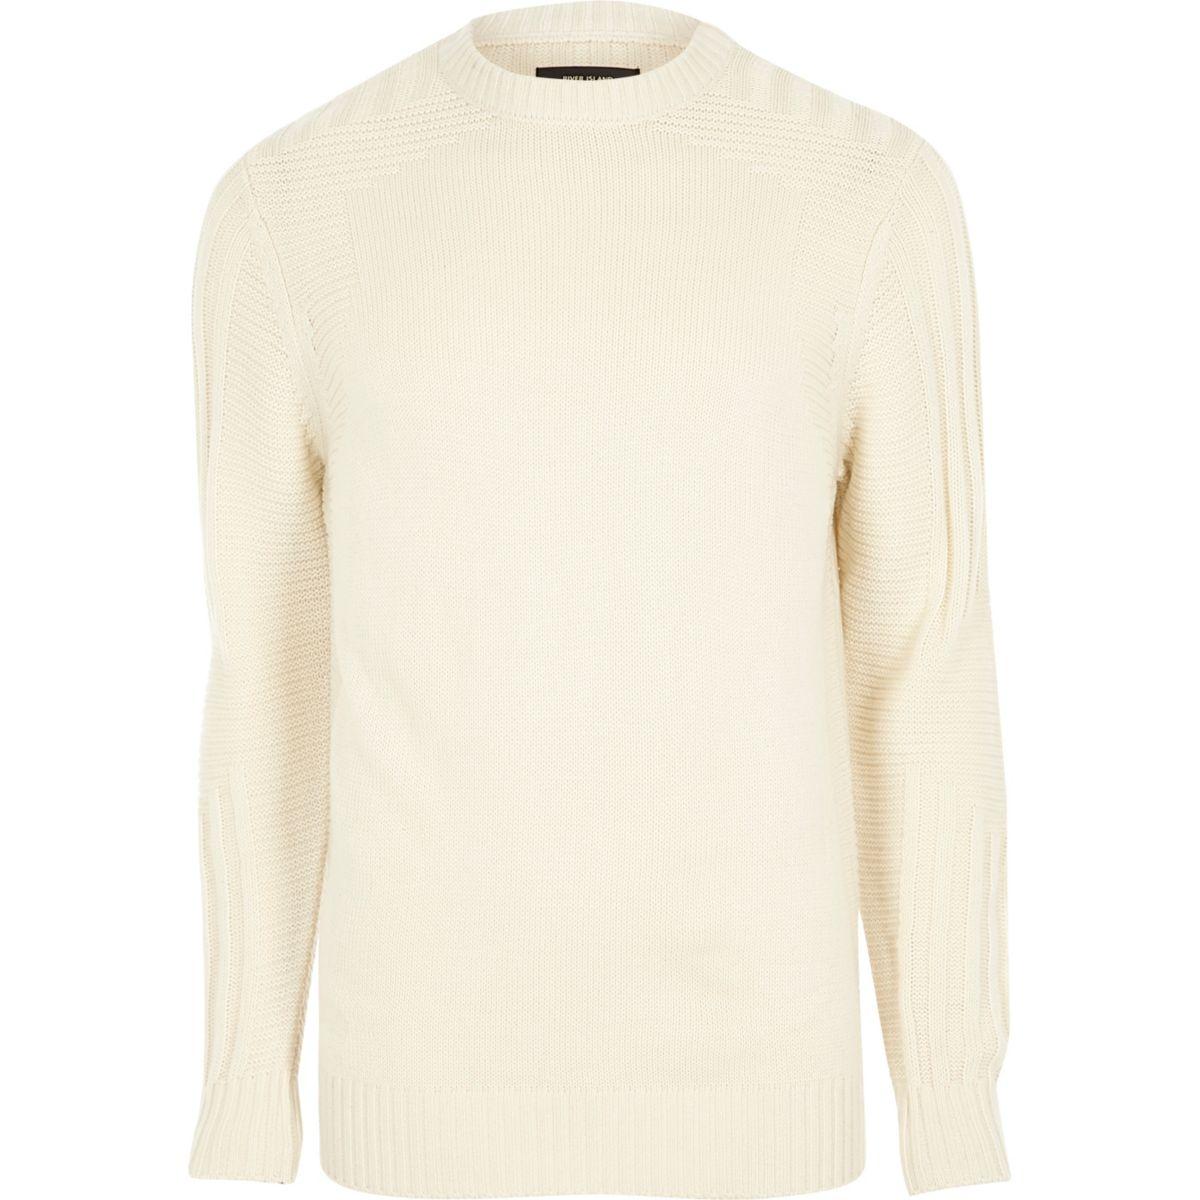 Cream textured crew neck knit sweater